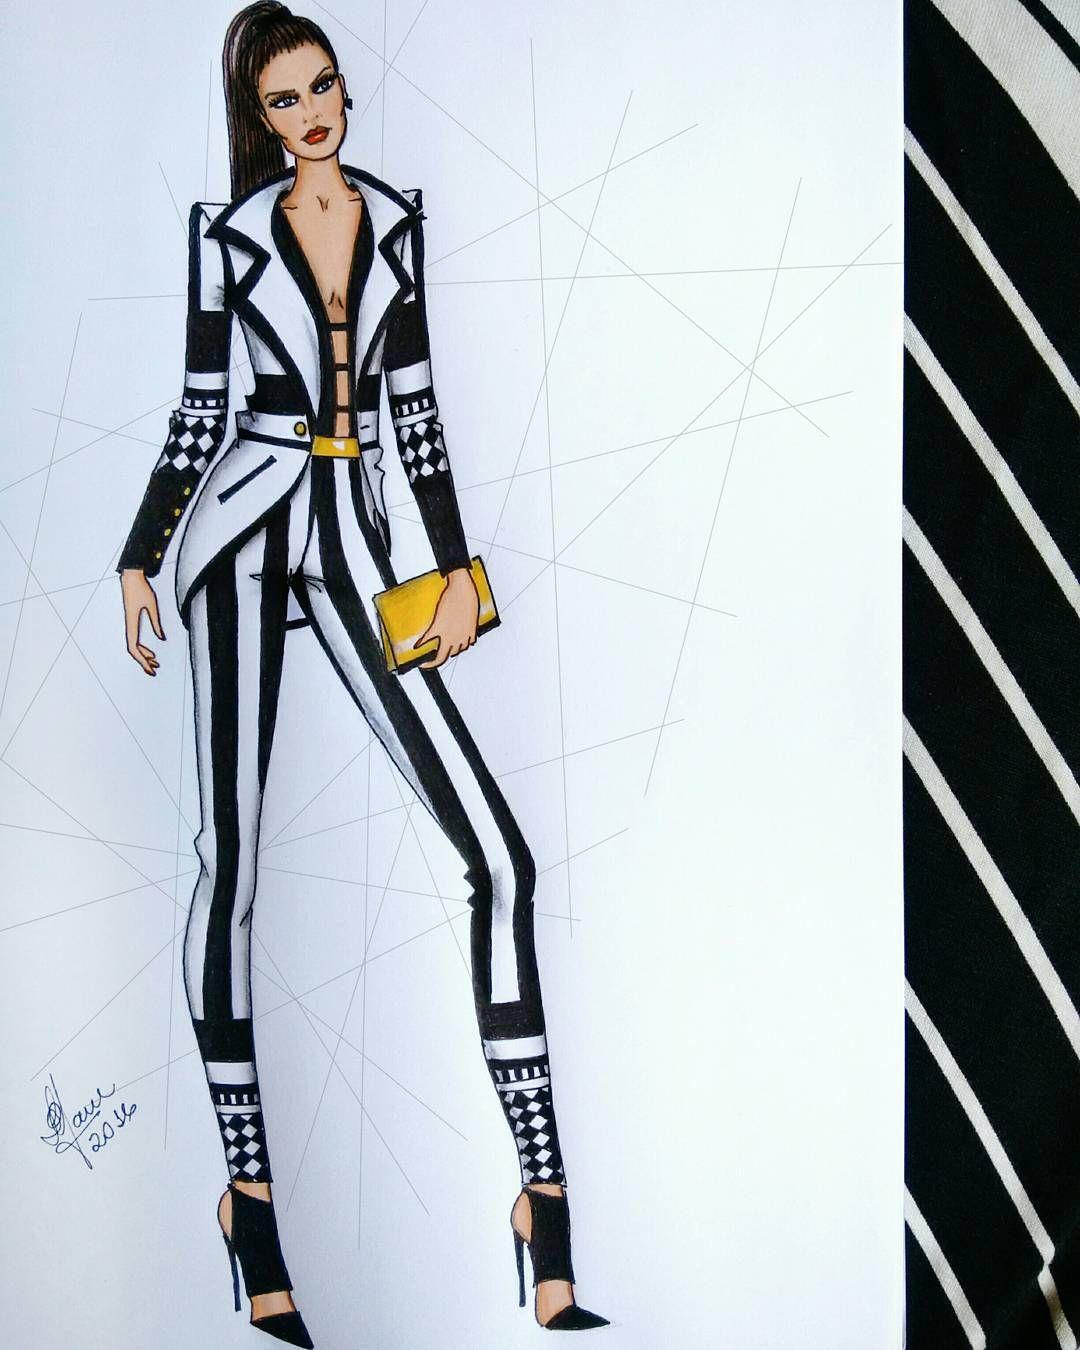 Bom fim de semana  Art  Pinterest  Fashion sketches Fashion